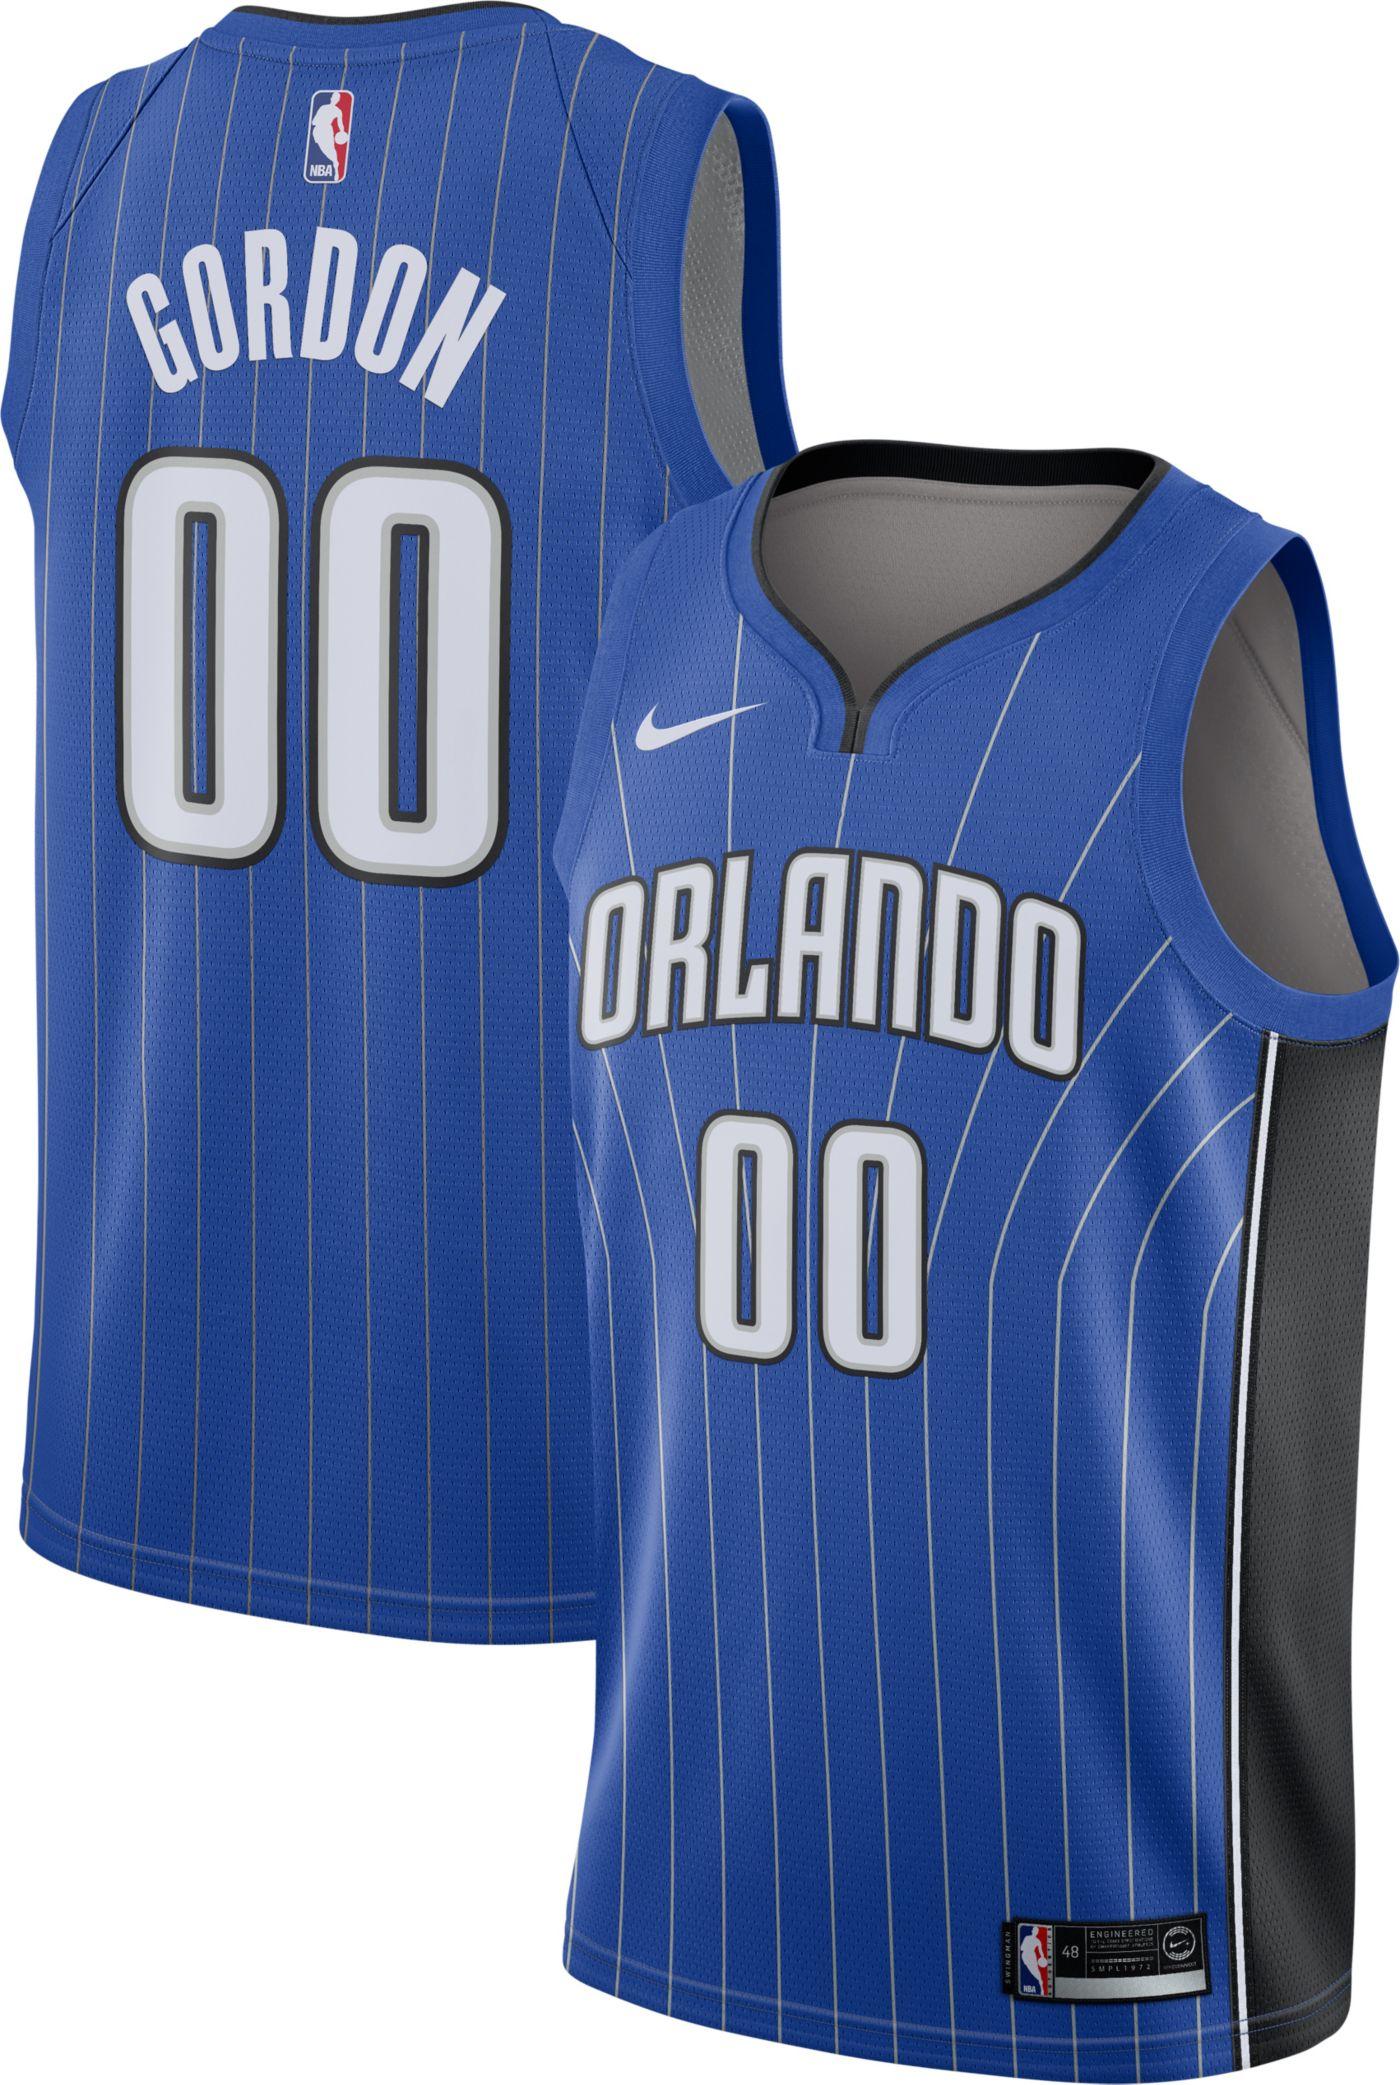 Nike Men's Orlando Magic Aaron Gordon #00 Royal Dri-FIT Swingman Jersey